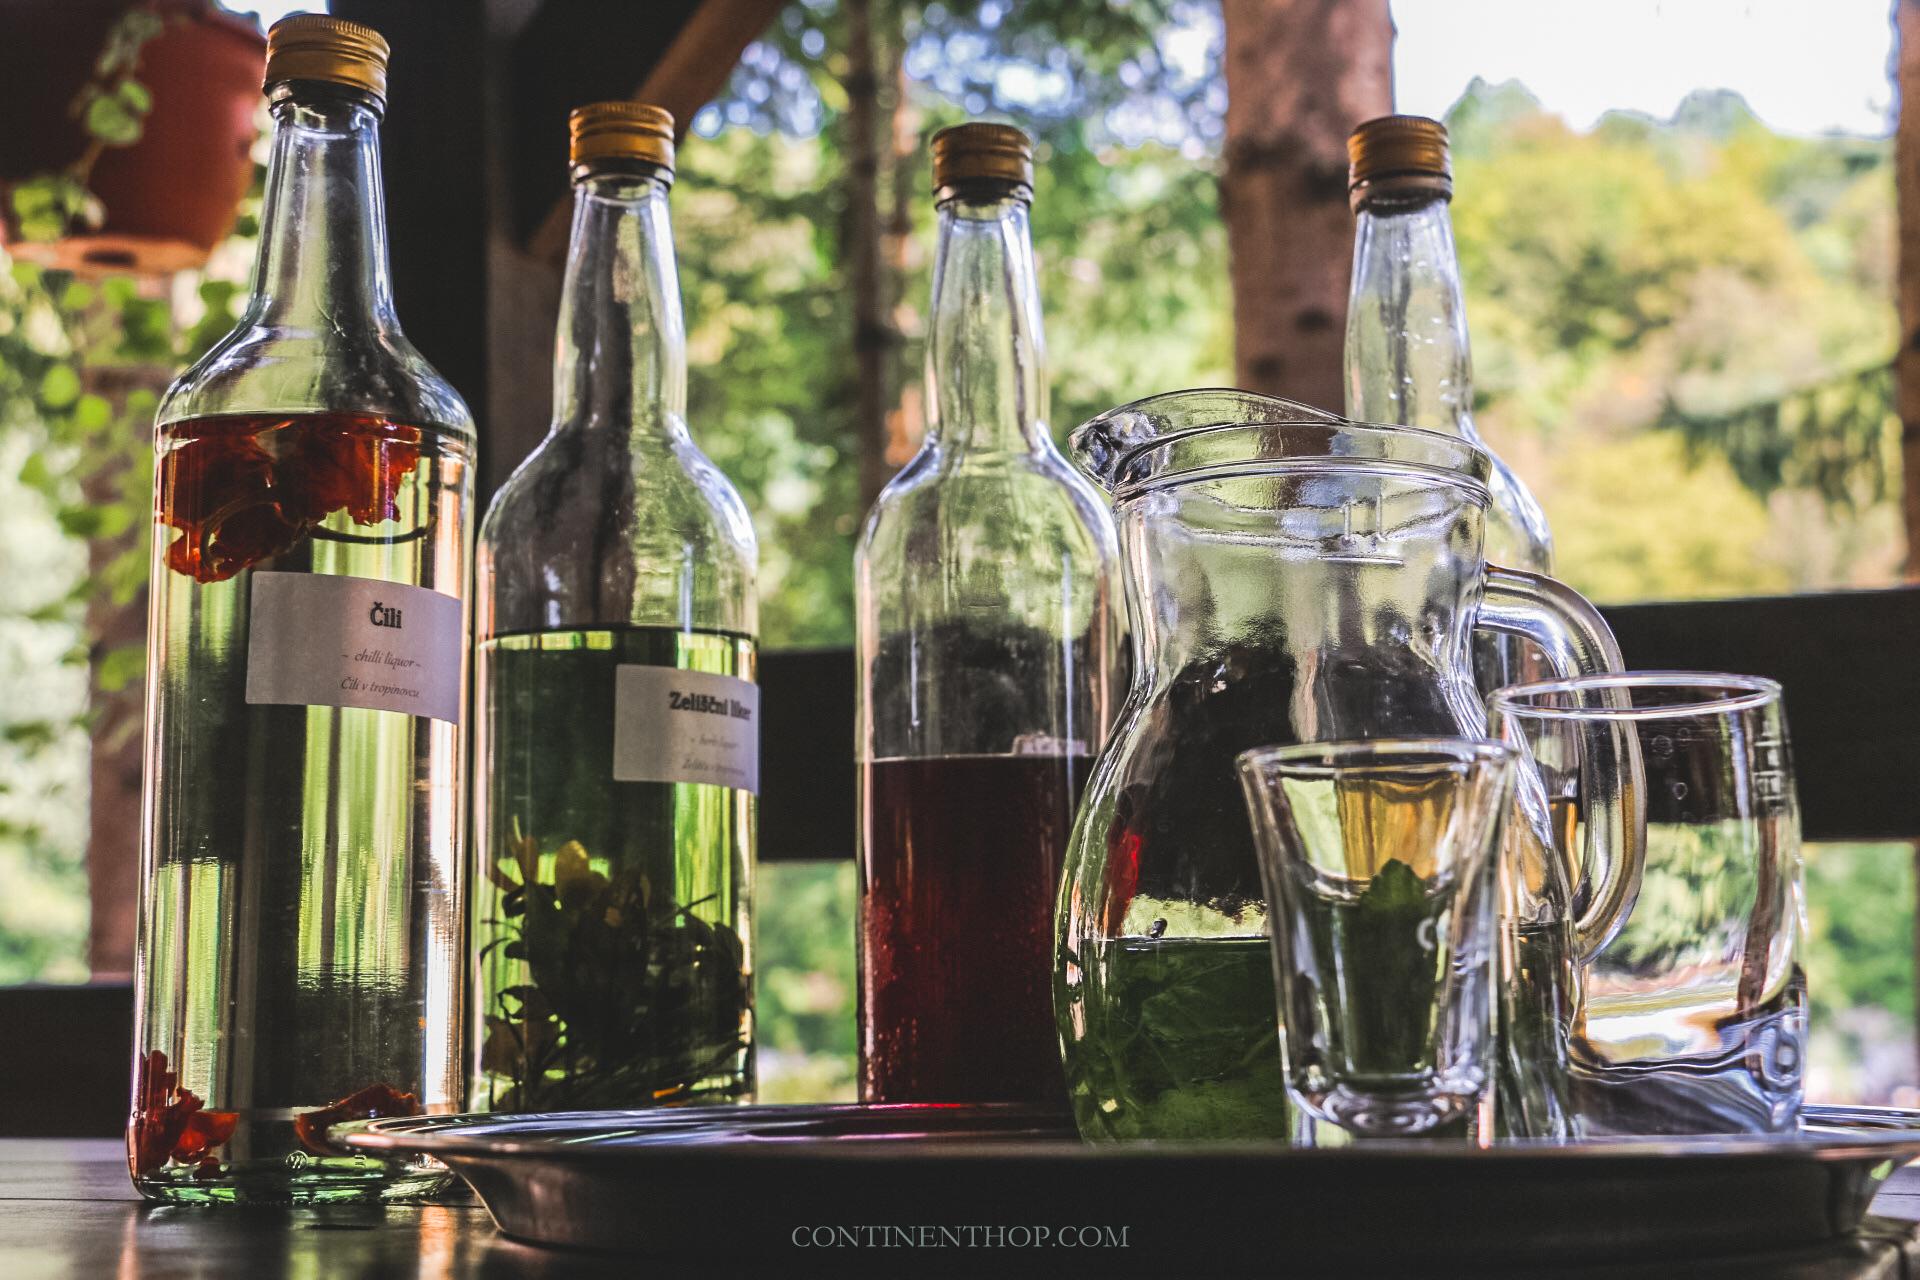 rajkija alcohol at domacija kuzma mill excursion from big berry luxury glamping resort in bela krajina slovenia